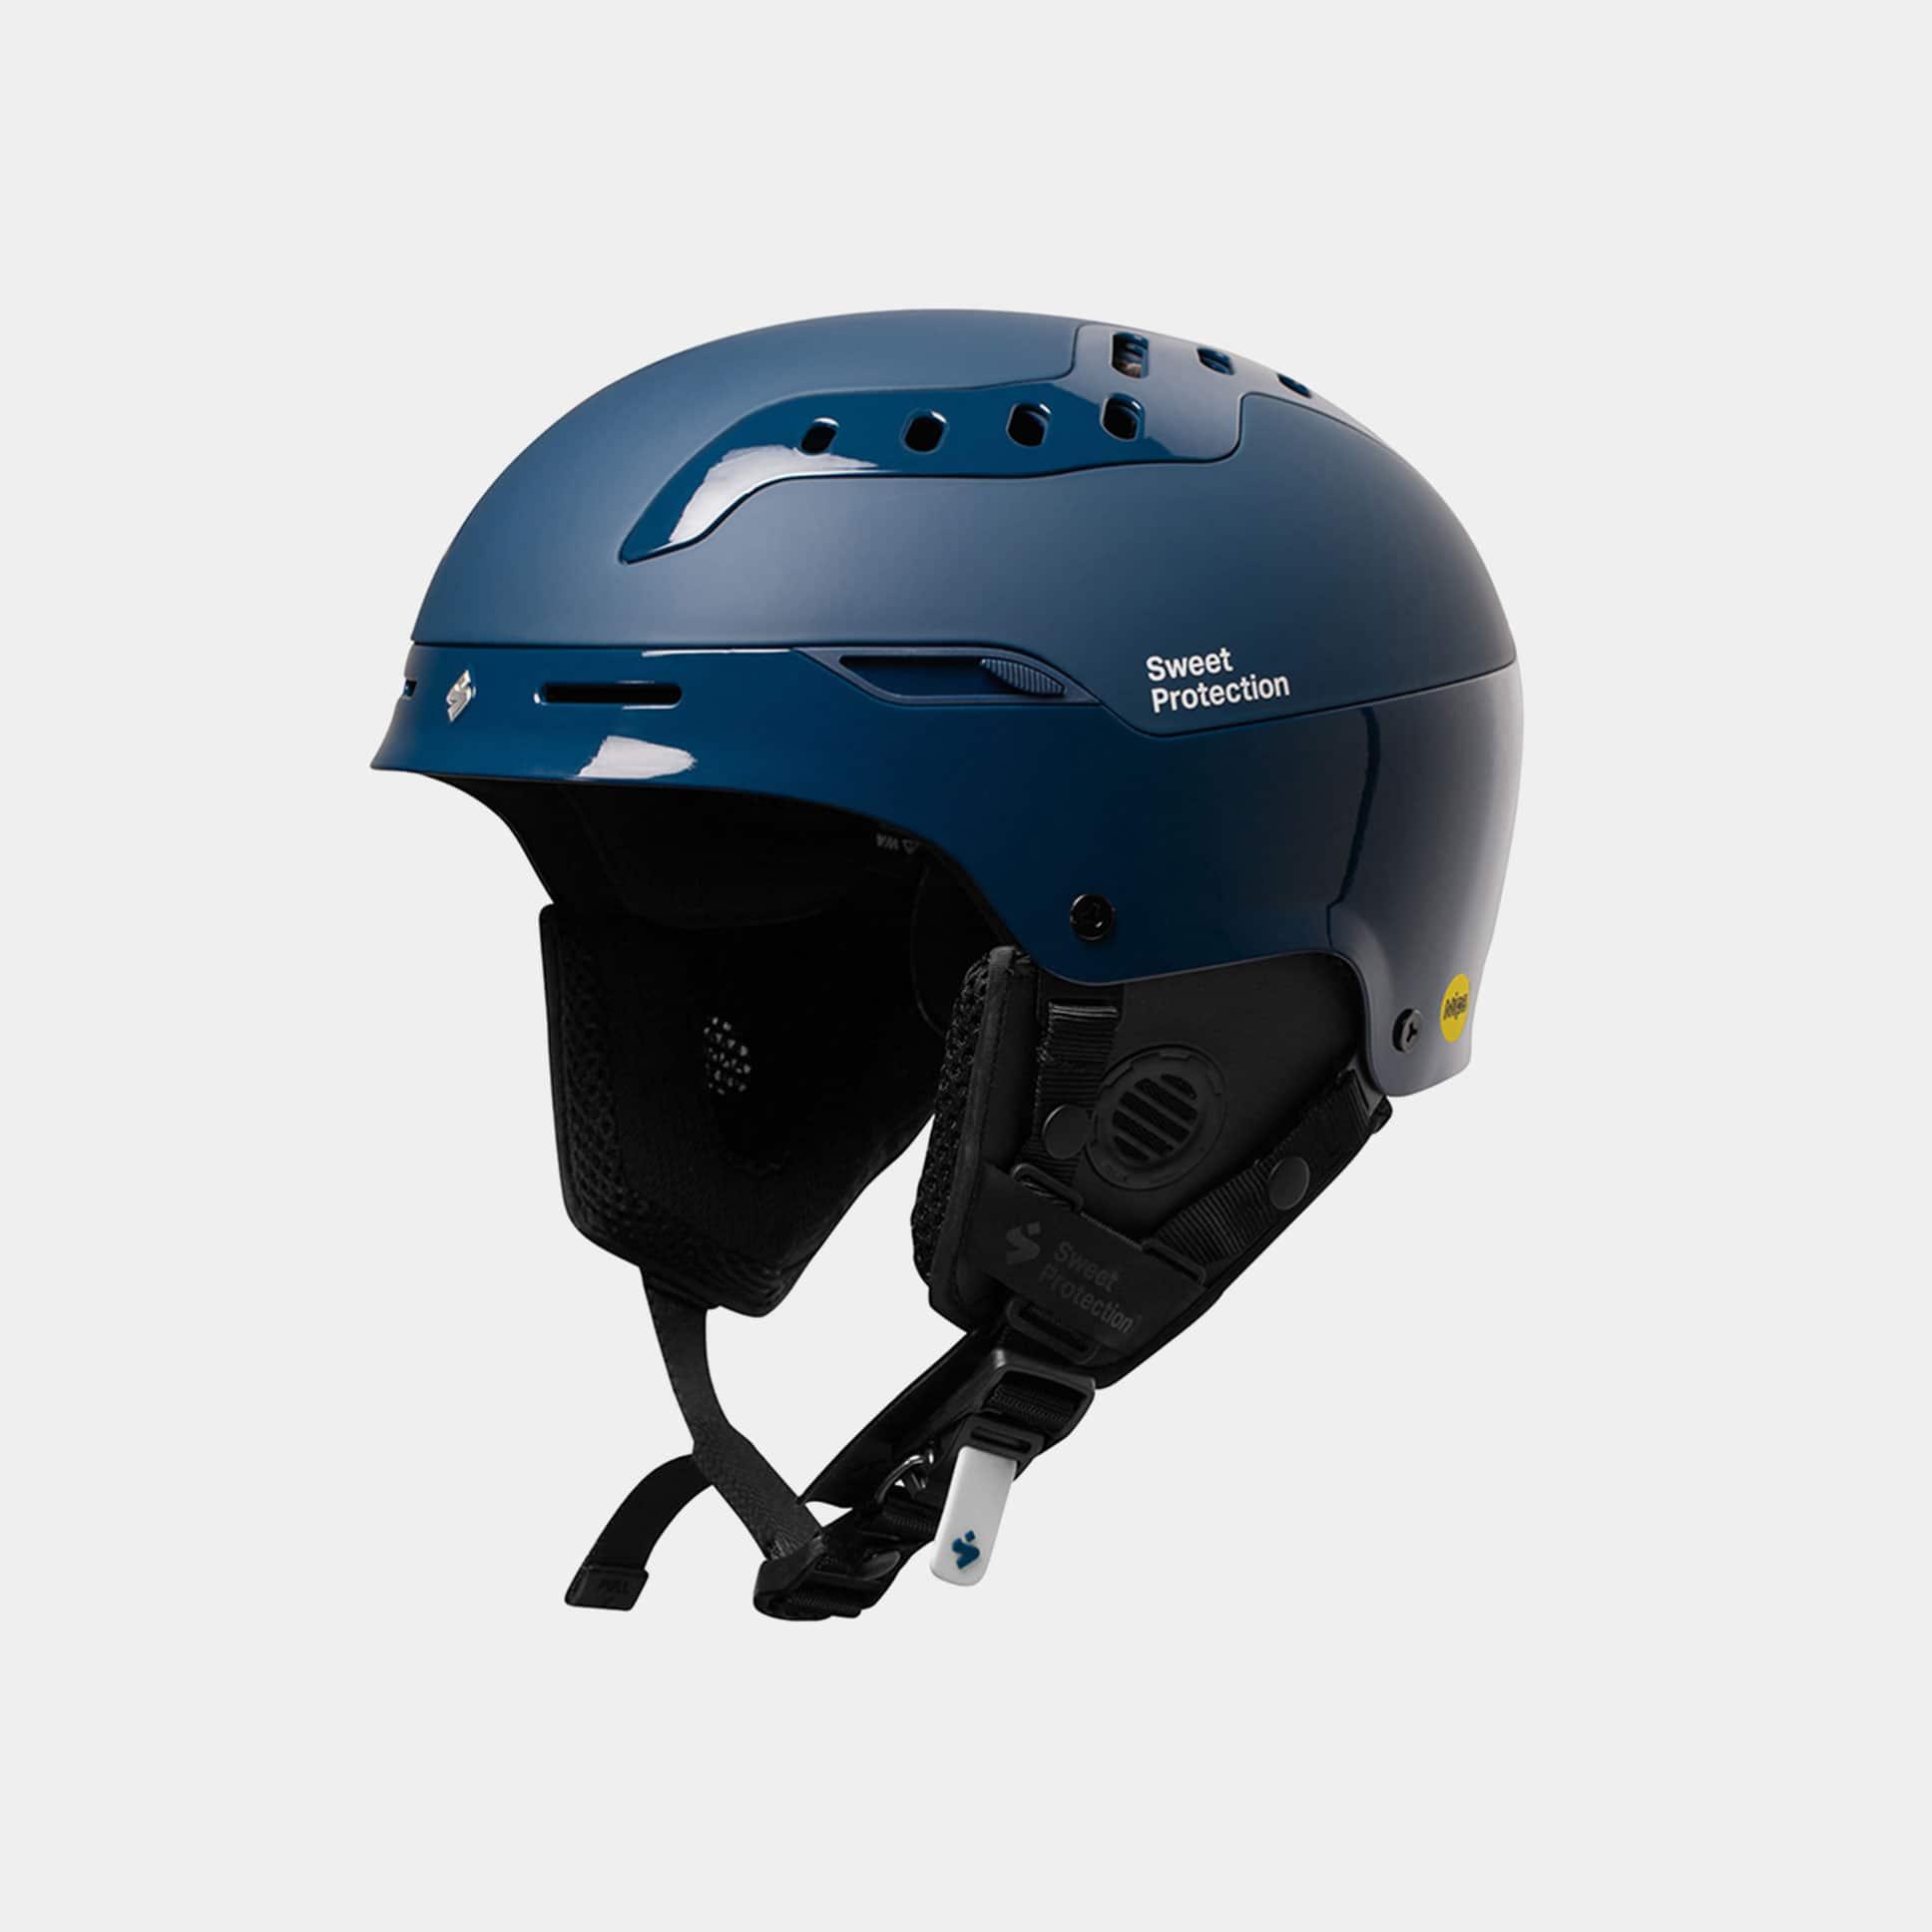 Outville_Skitourenprodukte_Sweet-Protection-Switcher-MIPS-Helmet